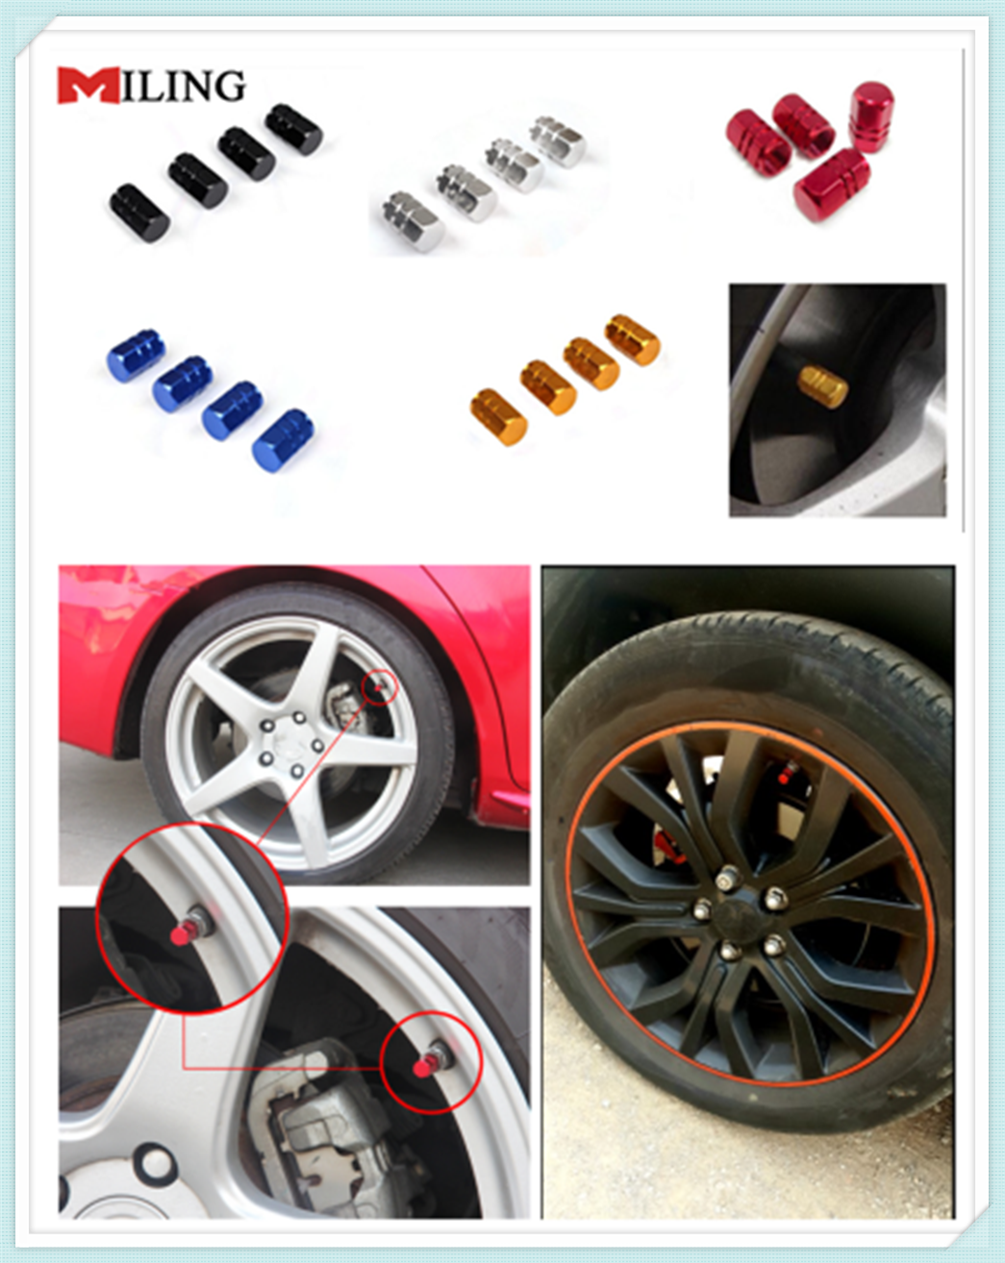 Aluminum Car Wheel Tires Valves Tyre Stem Air Caps Airtight Cover For Nissan Teana Sunny March Murano Geniss Juke